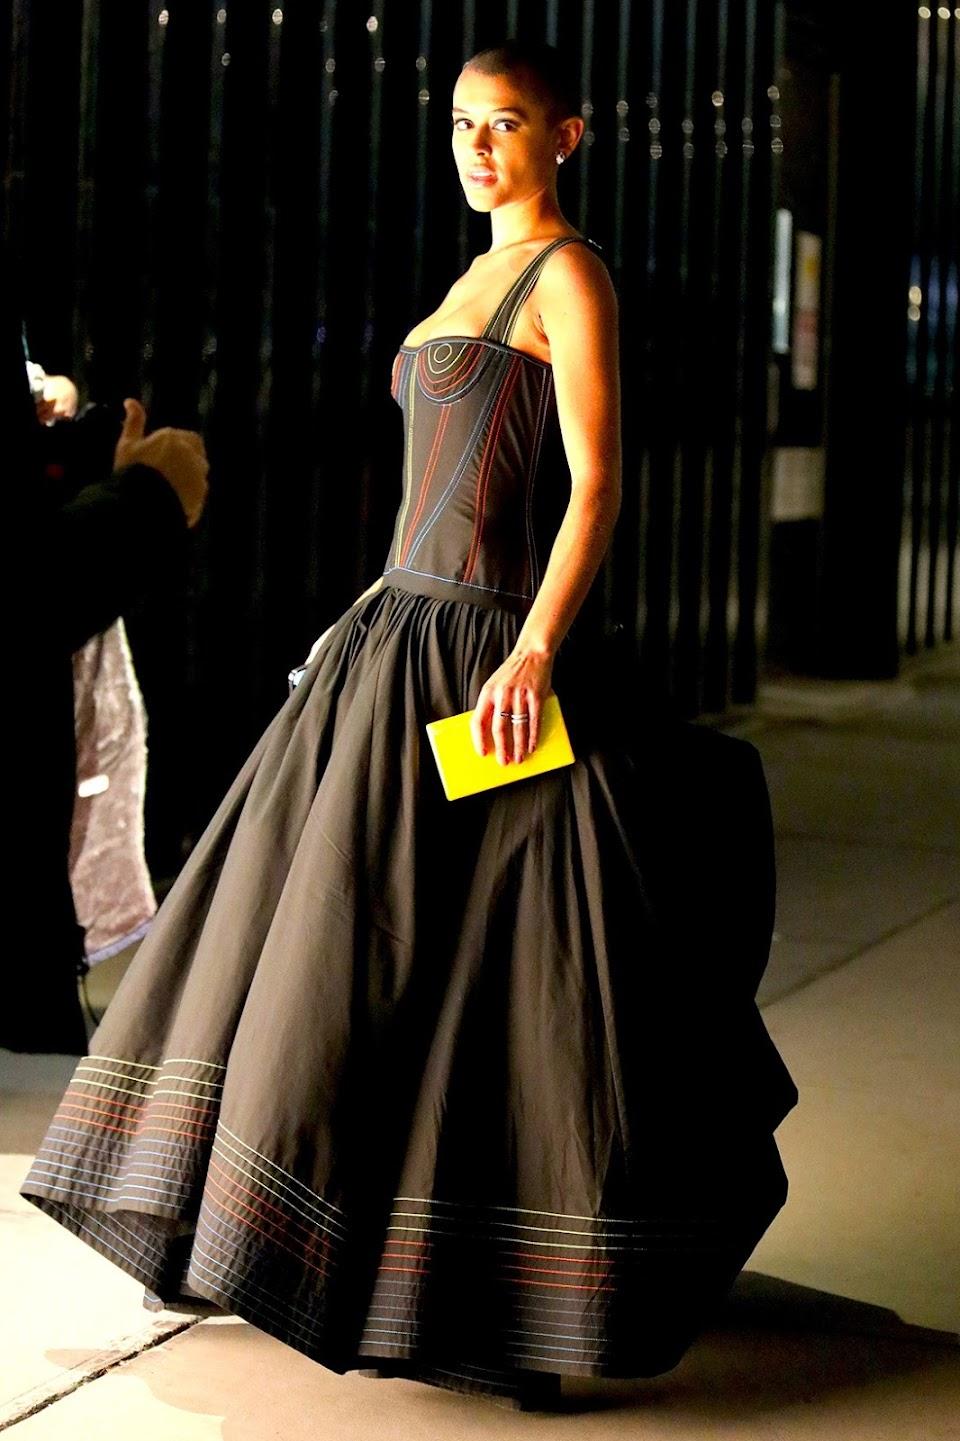 https---bae.hypebeast.com-files-2021-07-best-gossip-girl-reboot-fashion-moments-hbo-max-whitney-peak-jordan-alexander-emily-alyn-lind-2